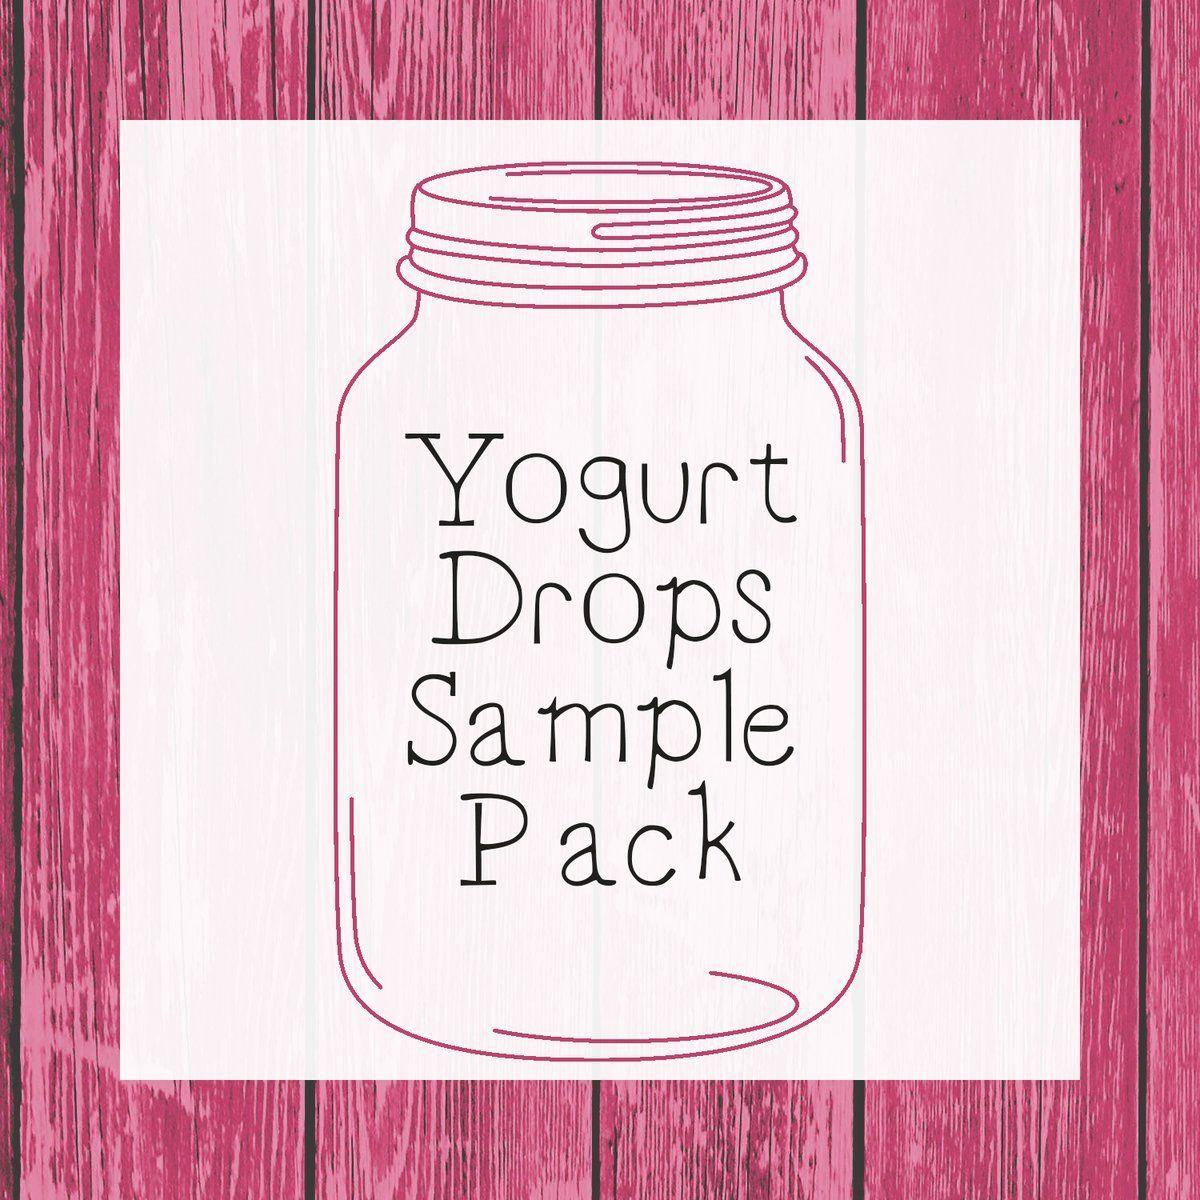 Yogurt Drops Sample Pack │ Rat Yogurt, Rat food, Rats